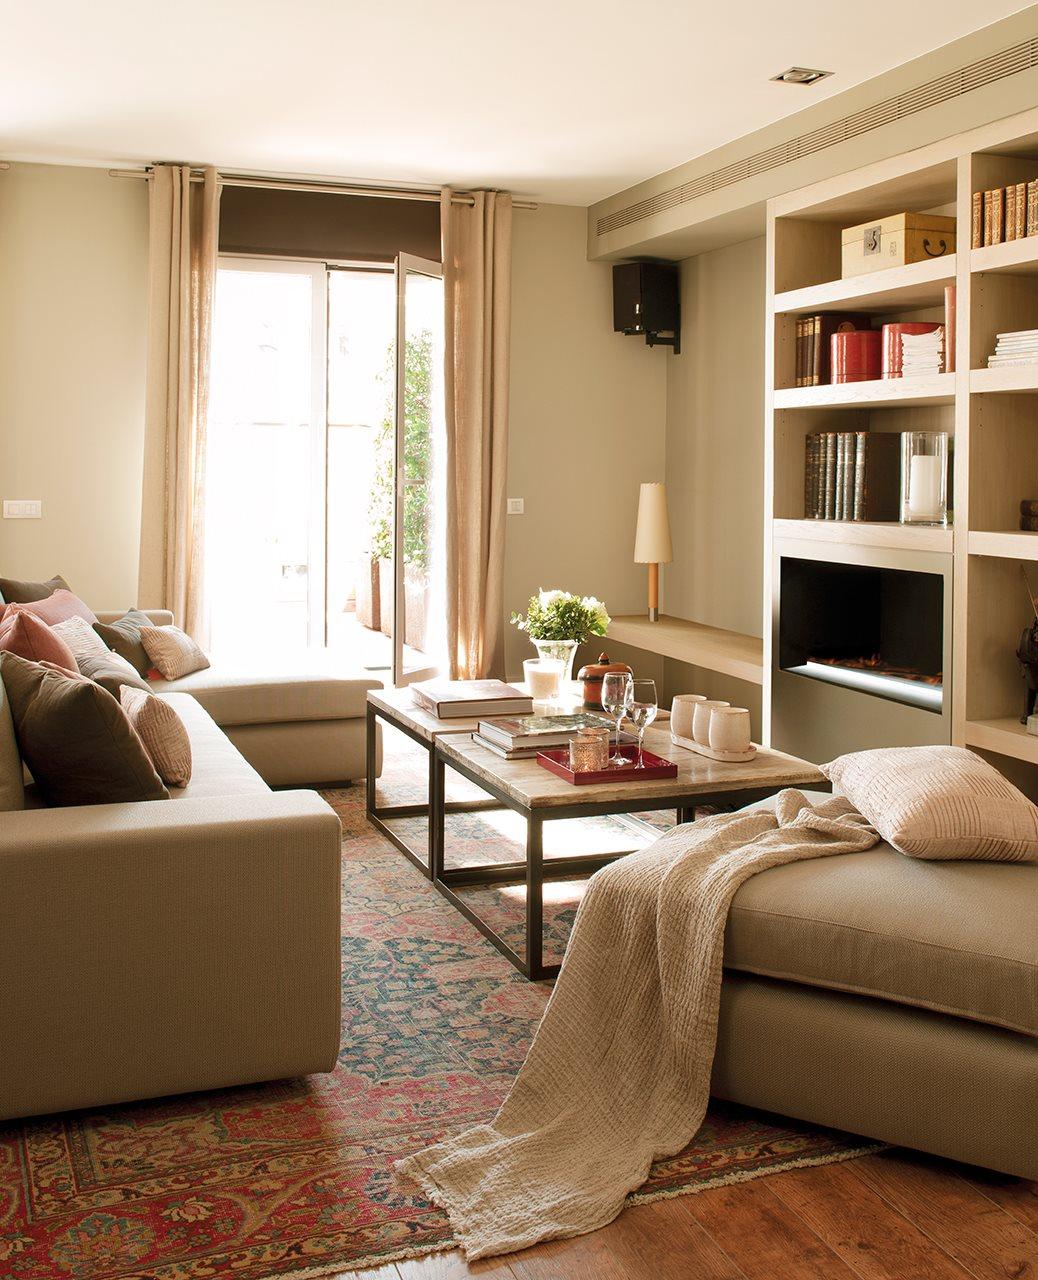 10 salones peque os muy bien decorados for Salones modernos pequenos